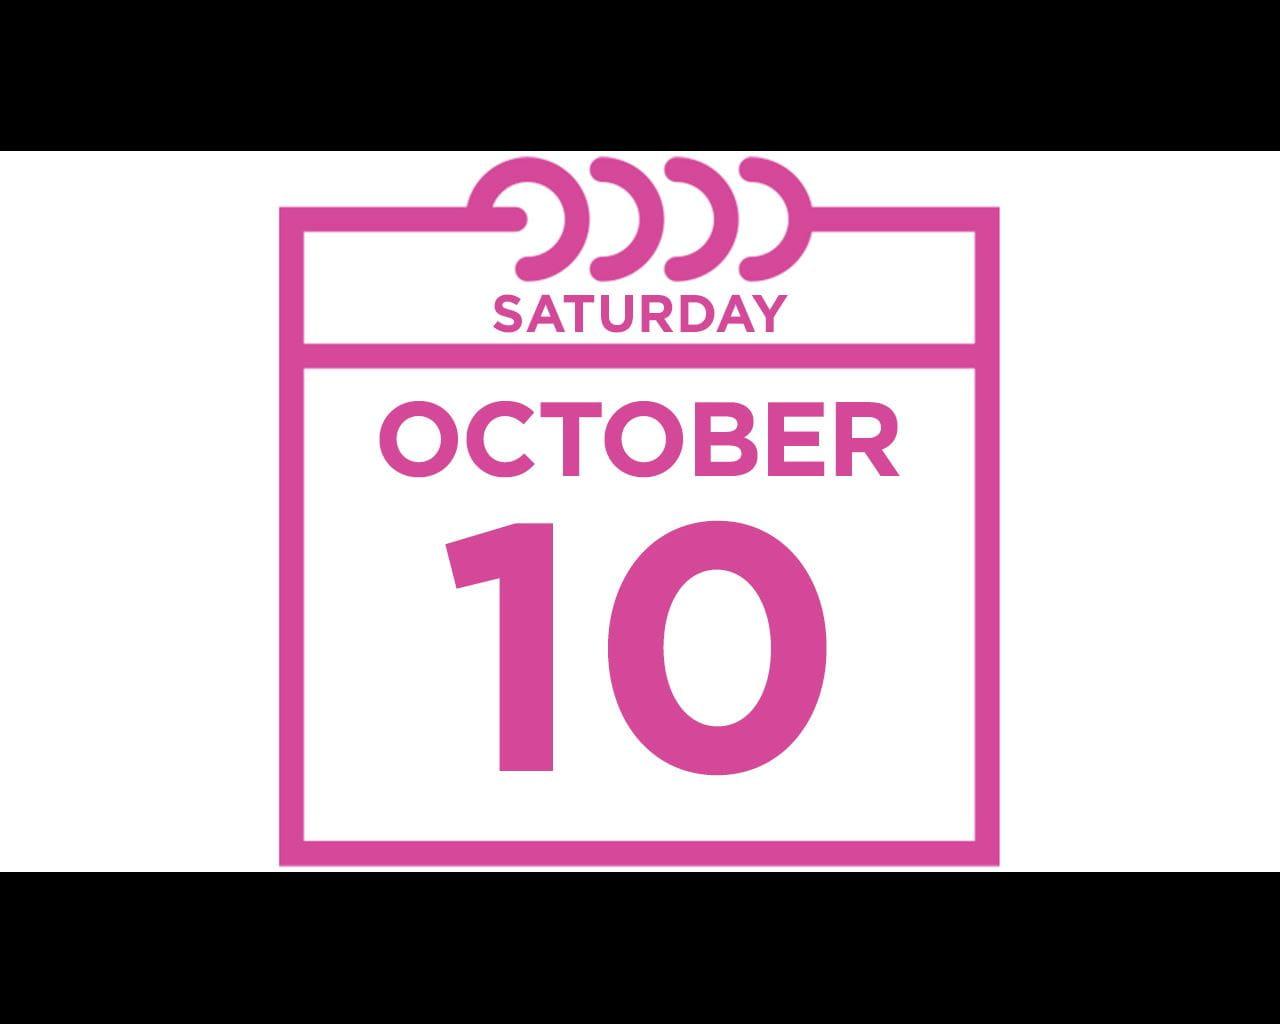 saturday october 10